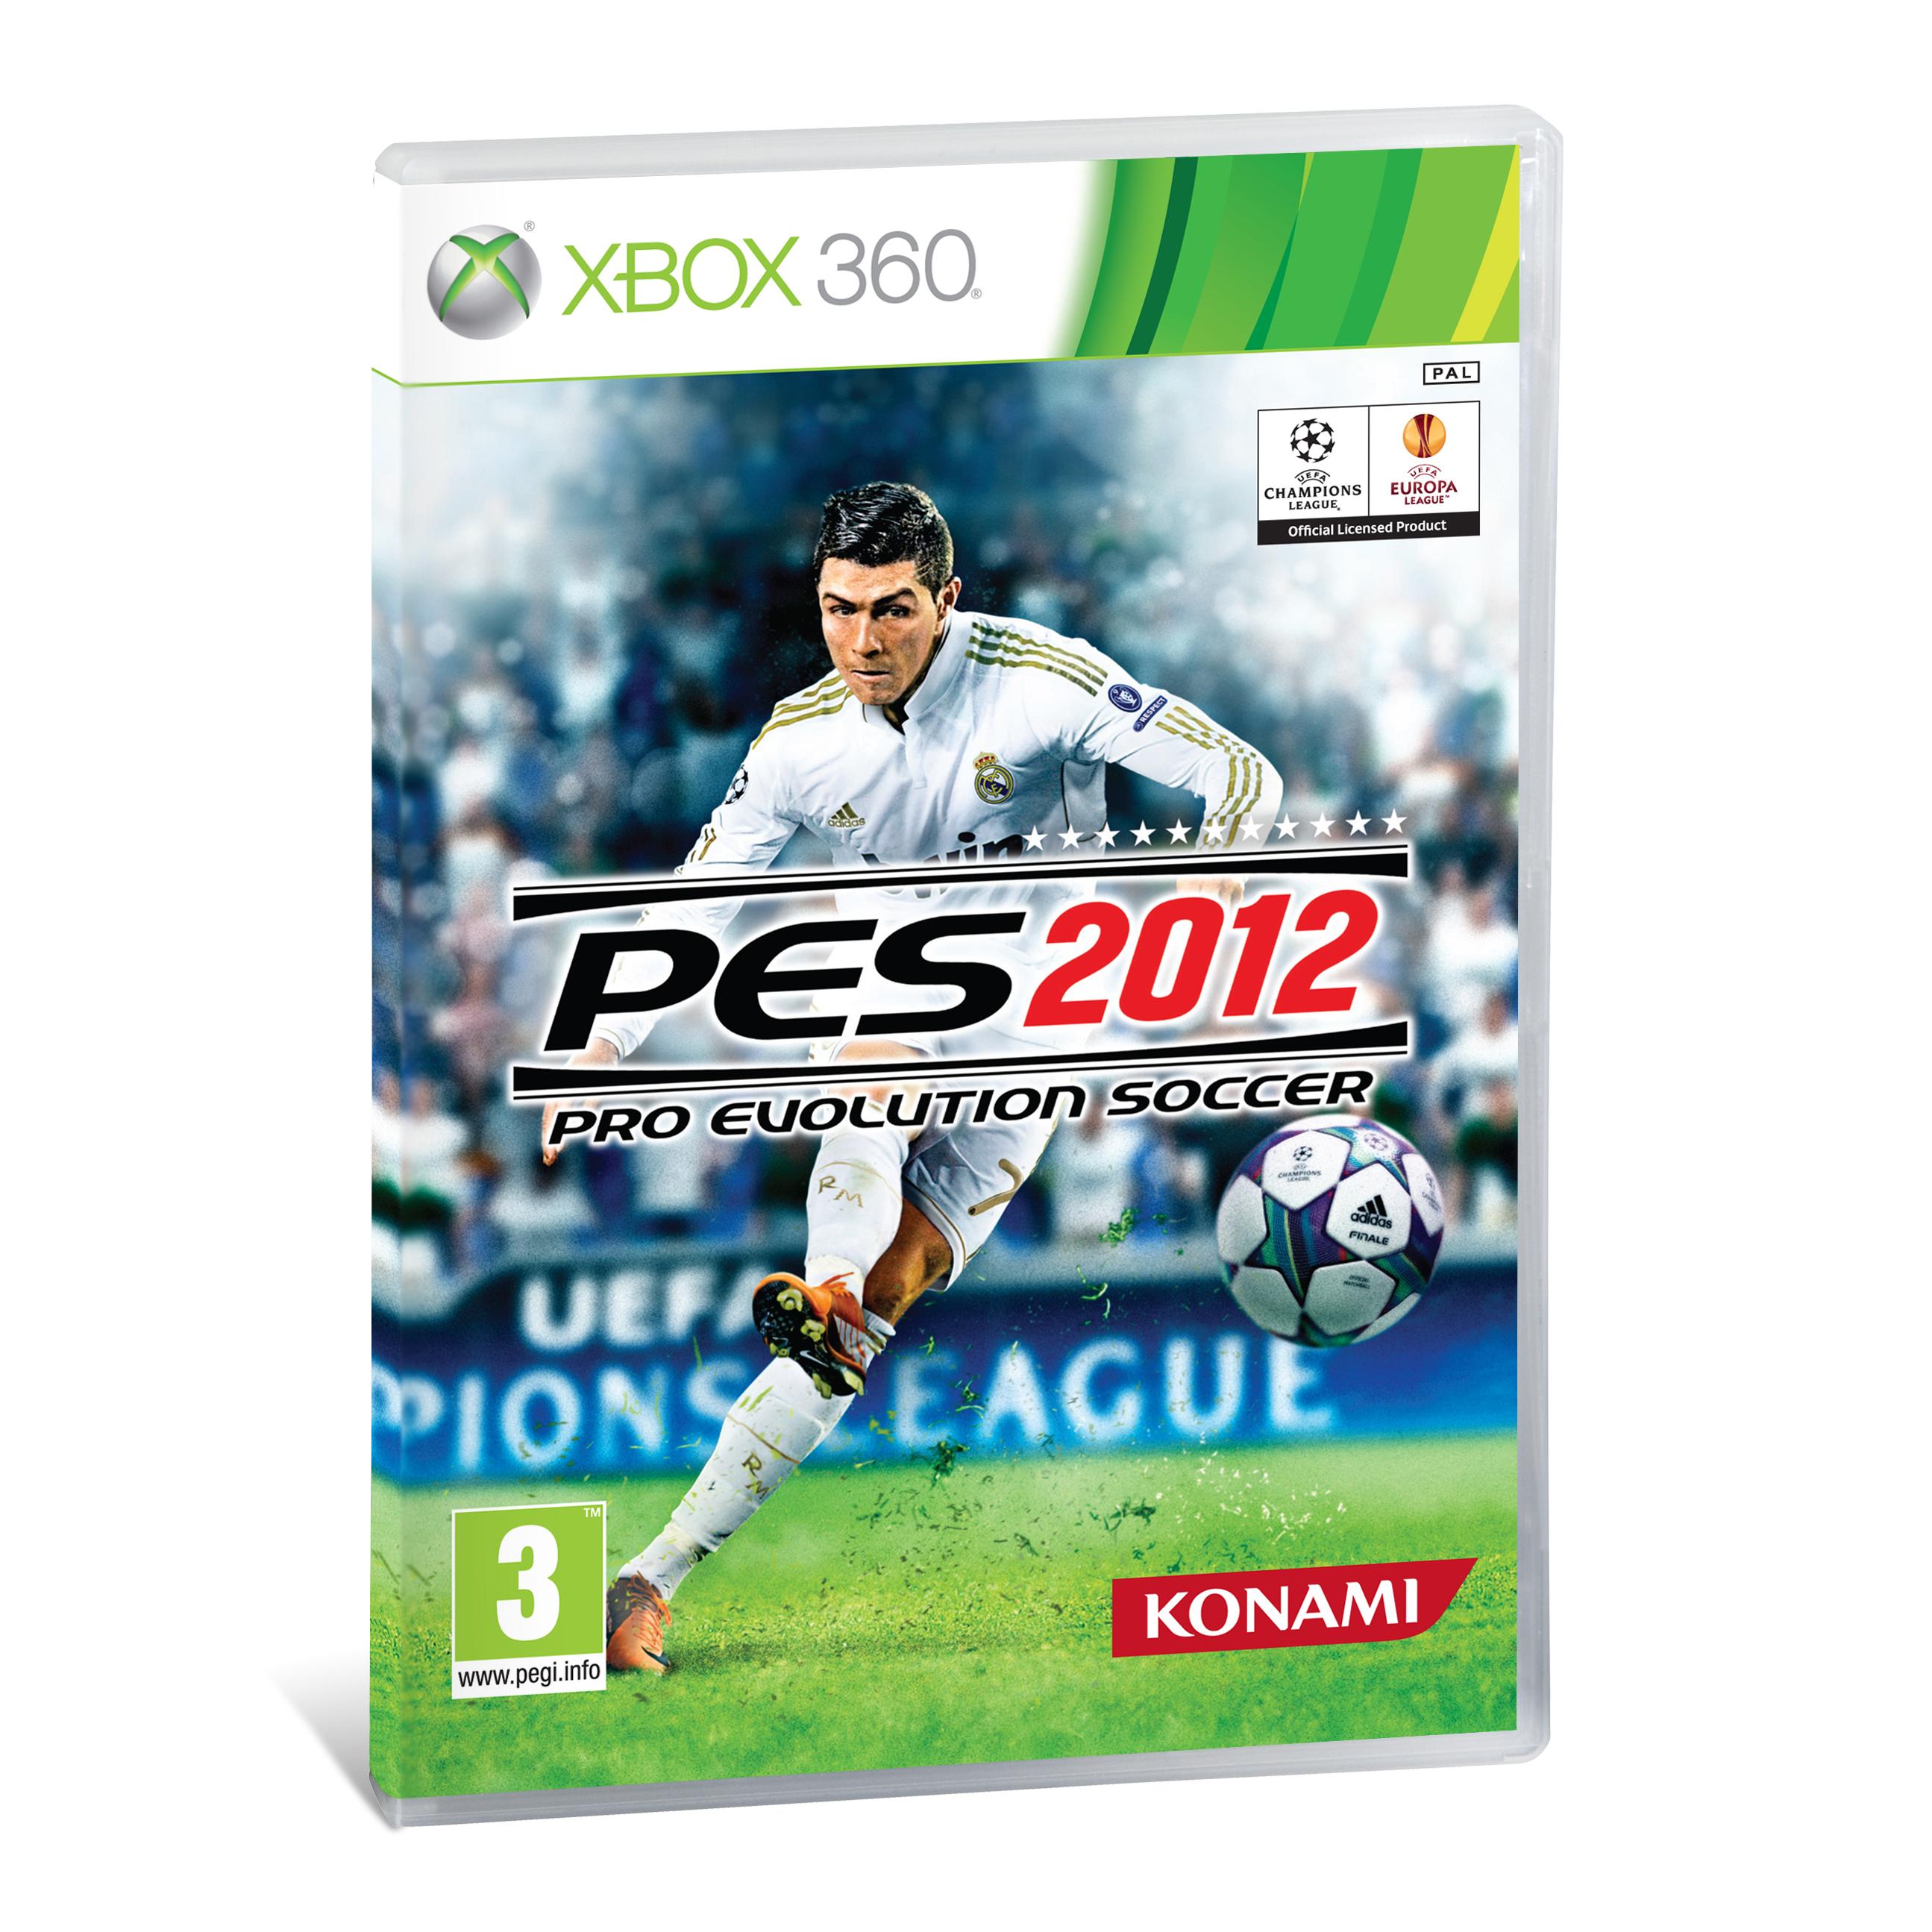 UEFA Champions League Pro Evolution Soccer 2012